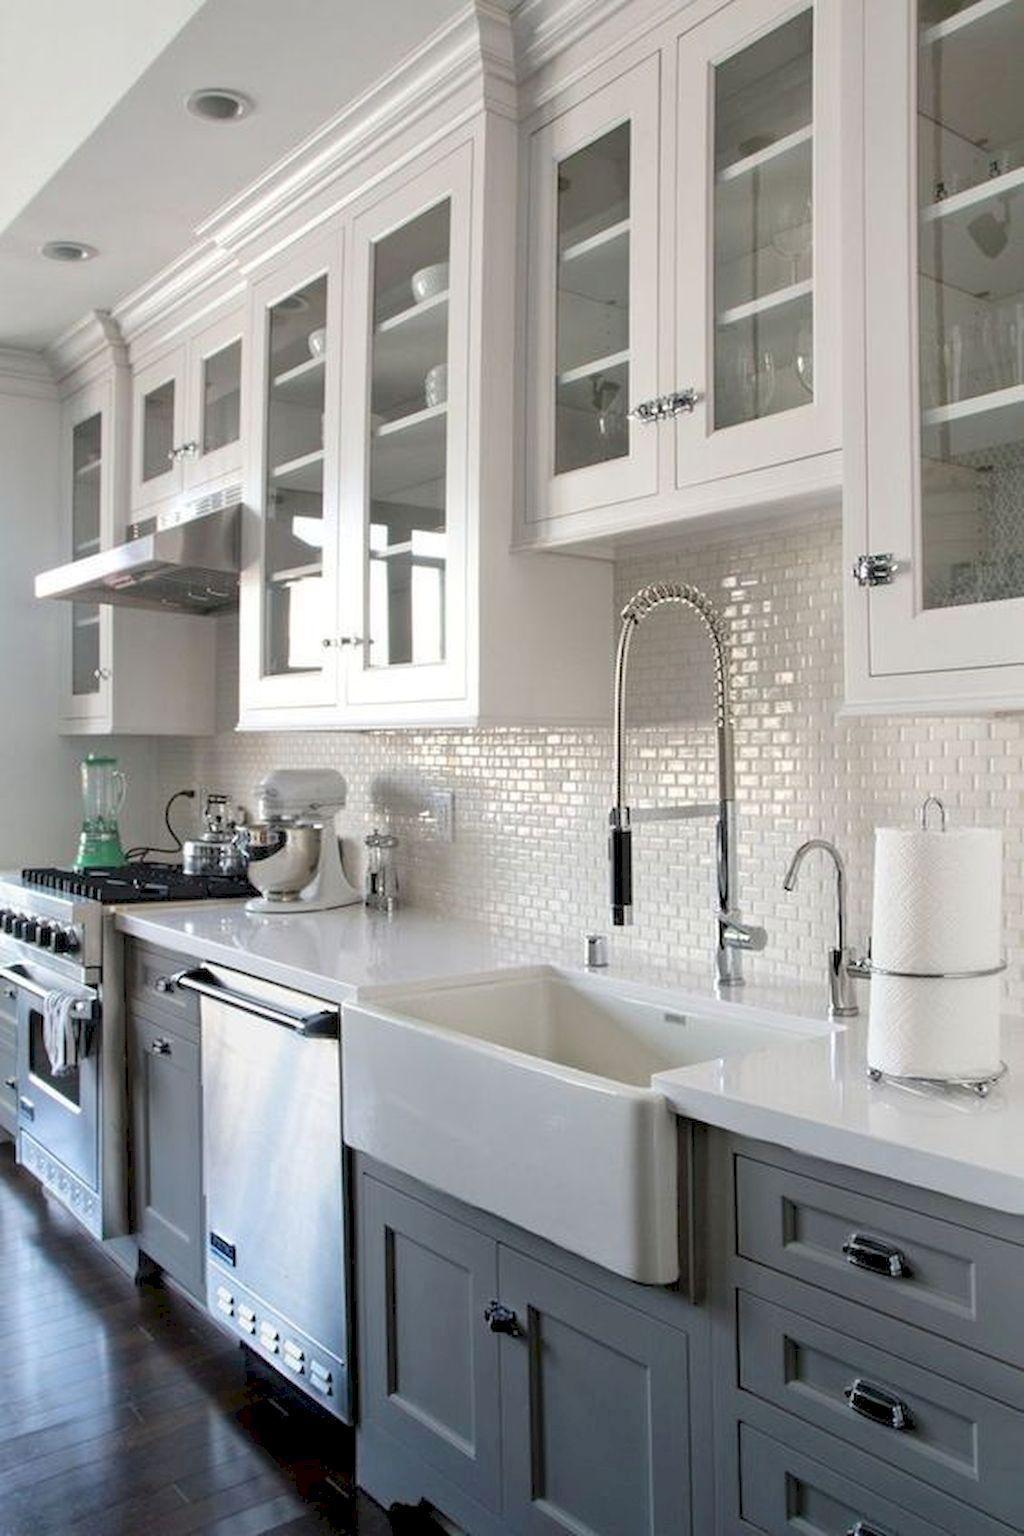 Best Kitchen Cabinets Ideas And Make Over 125 Kitchen